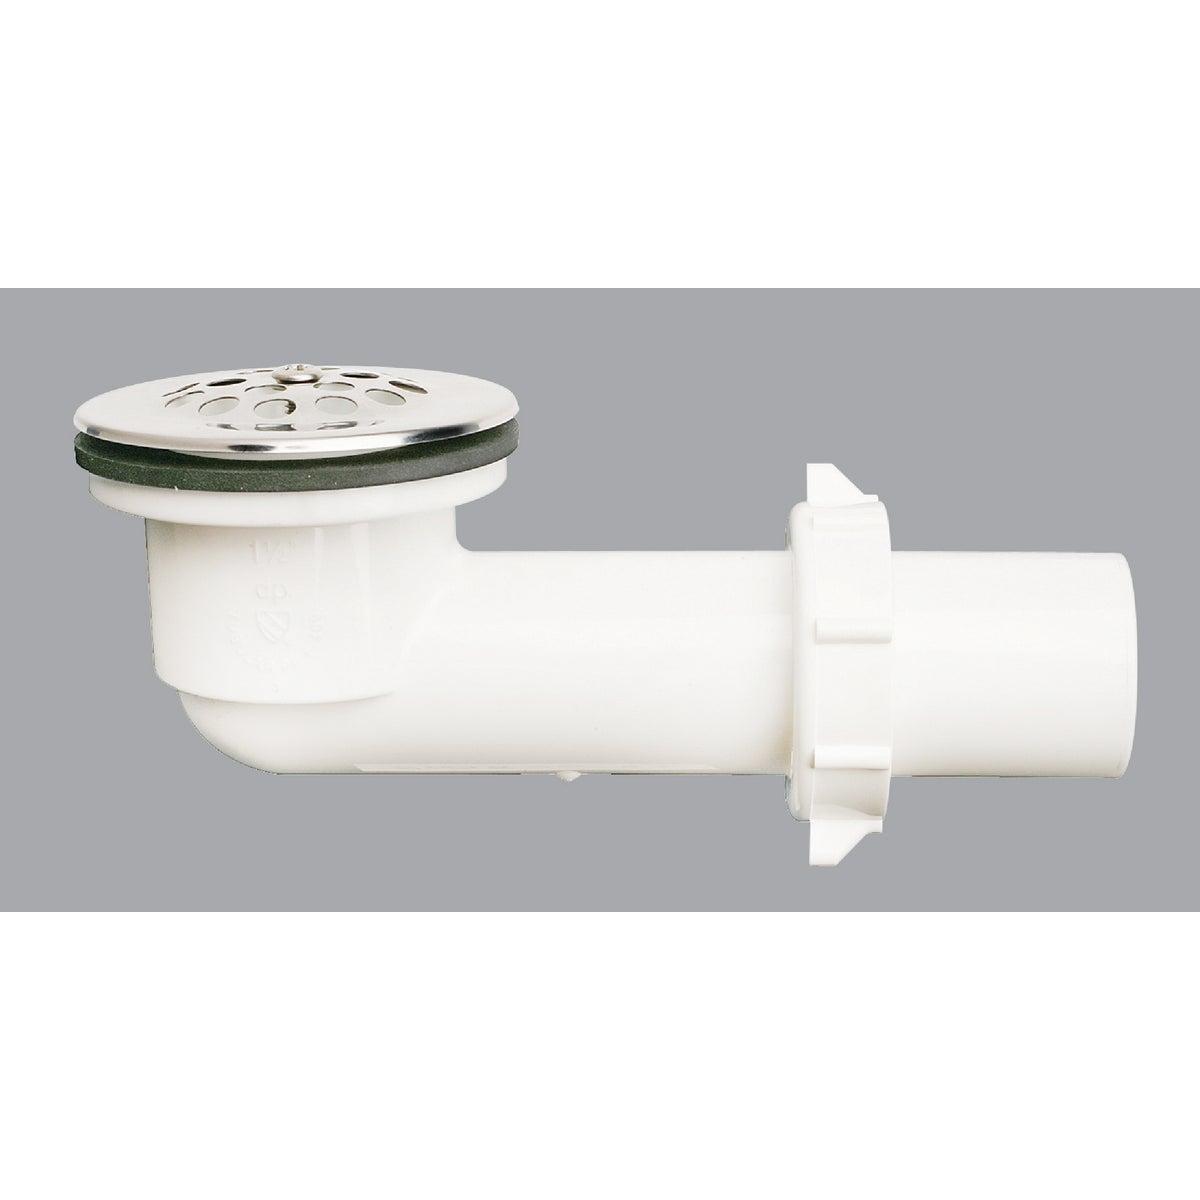 PVC TRIPLEVER WASTE SHOE